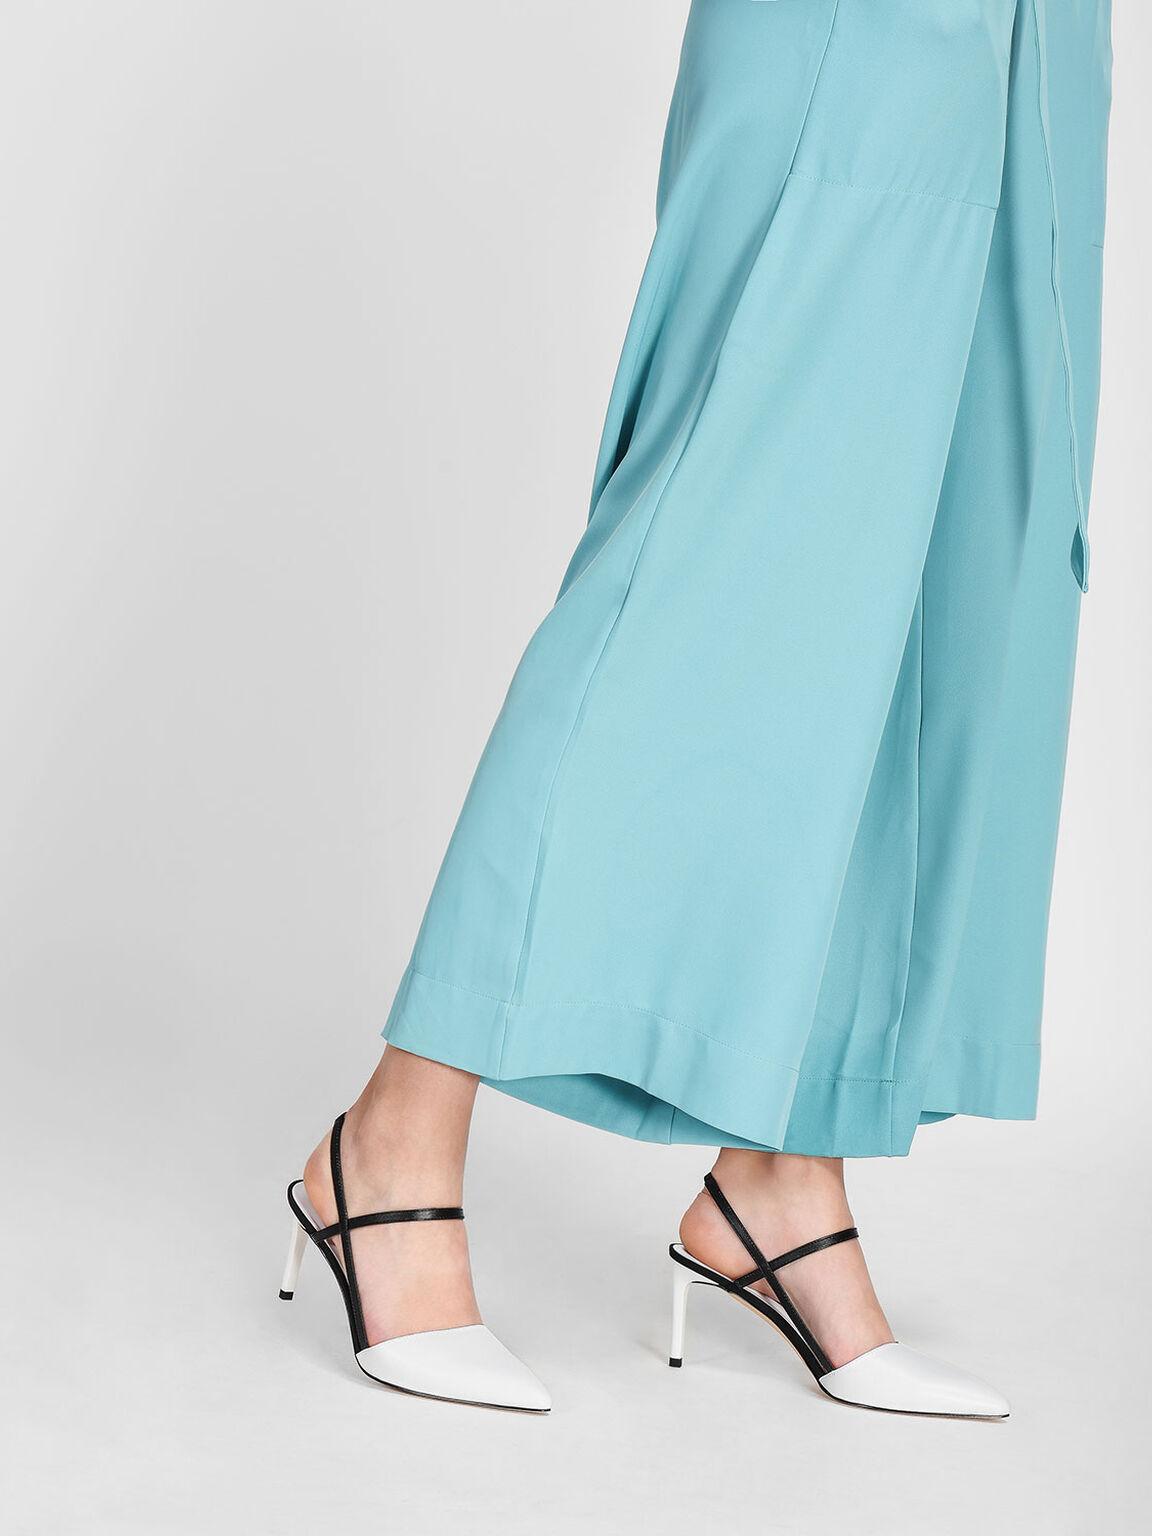 Contrast T-Bar Slingback Heels, White, hi-res